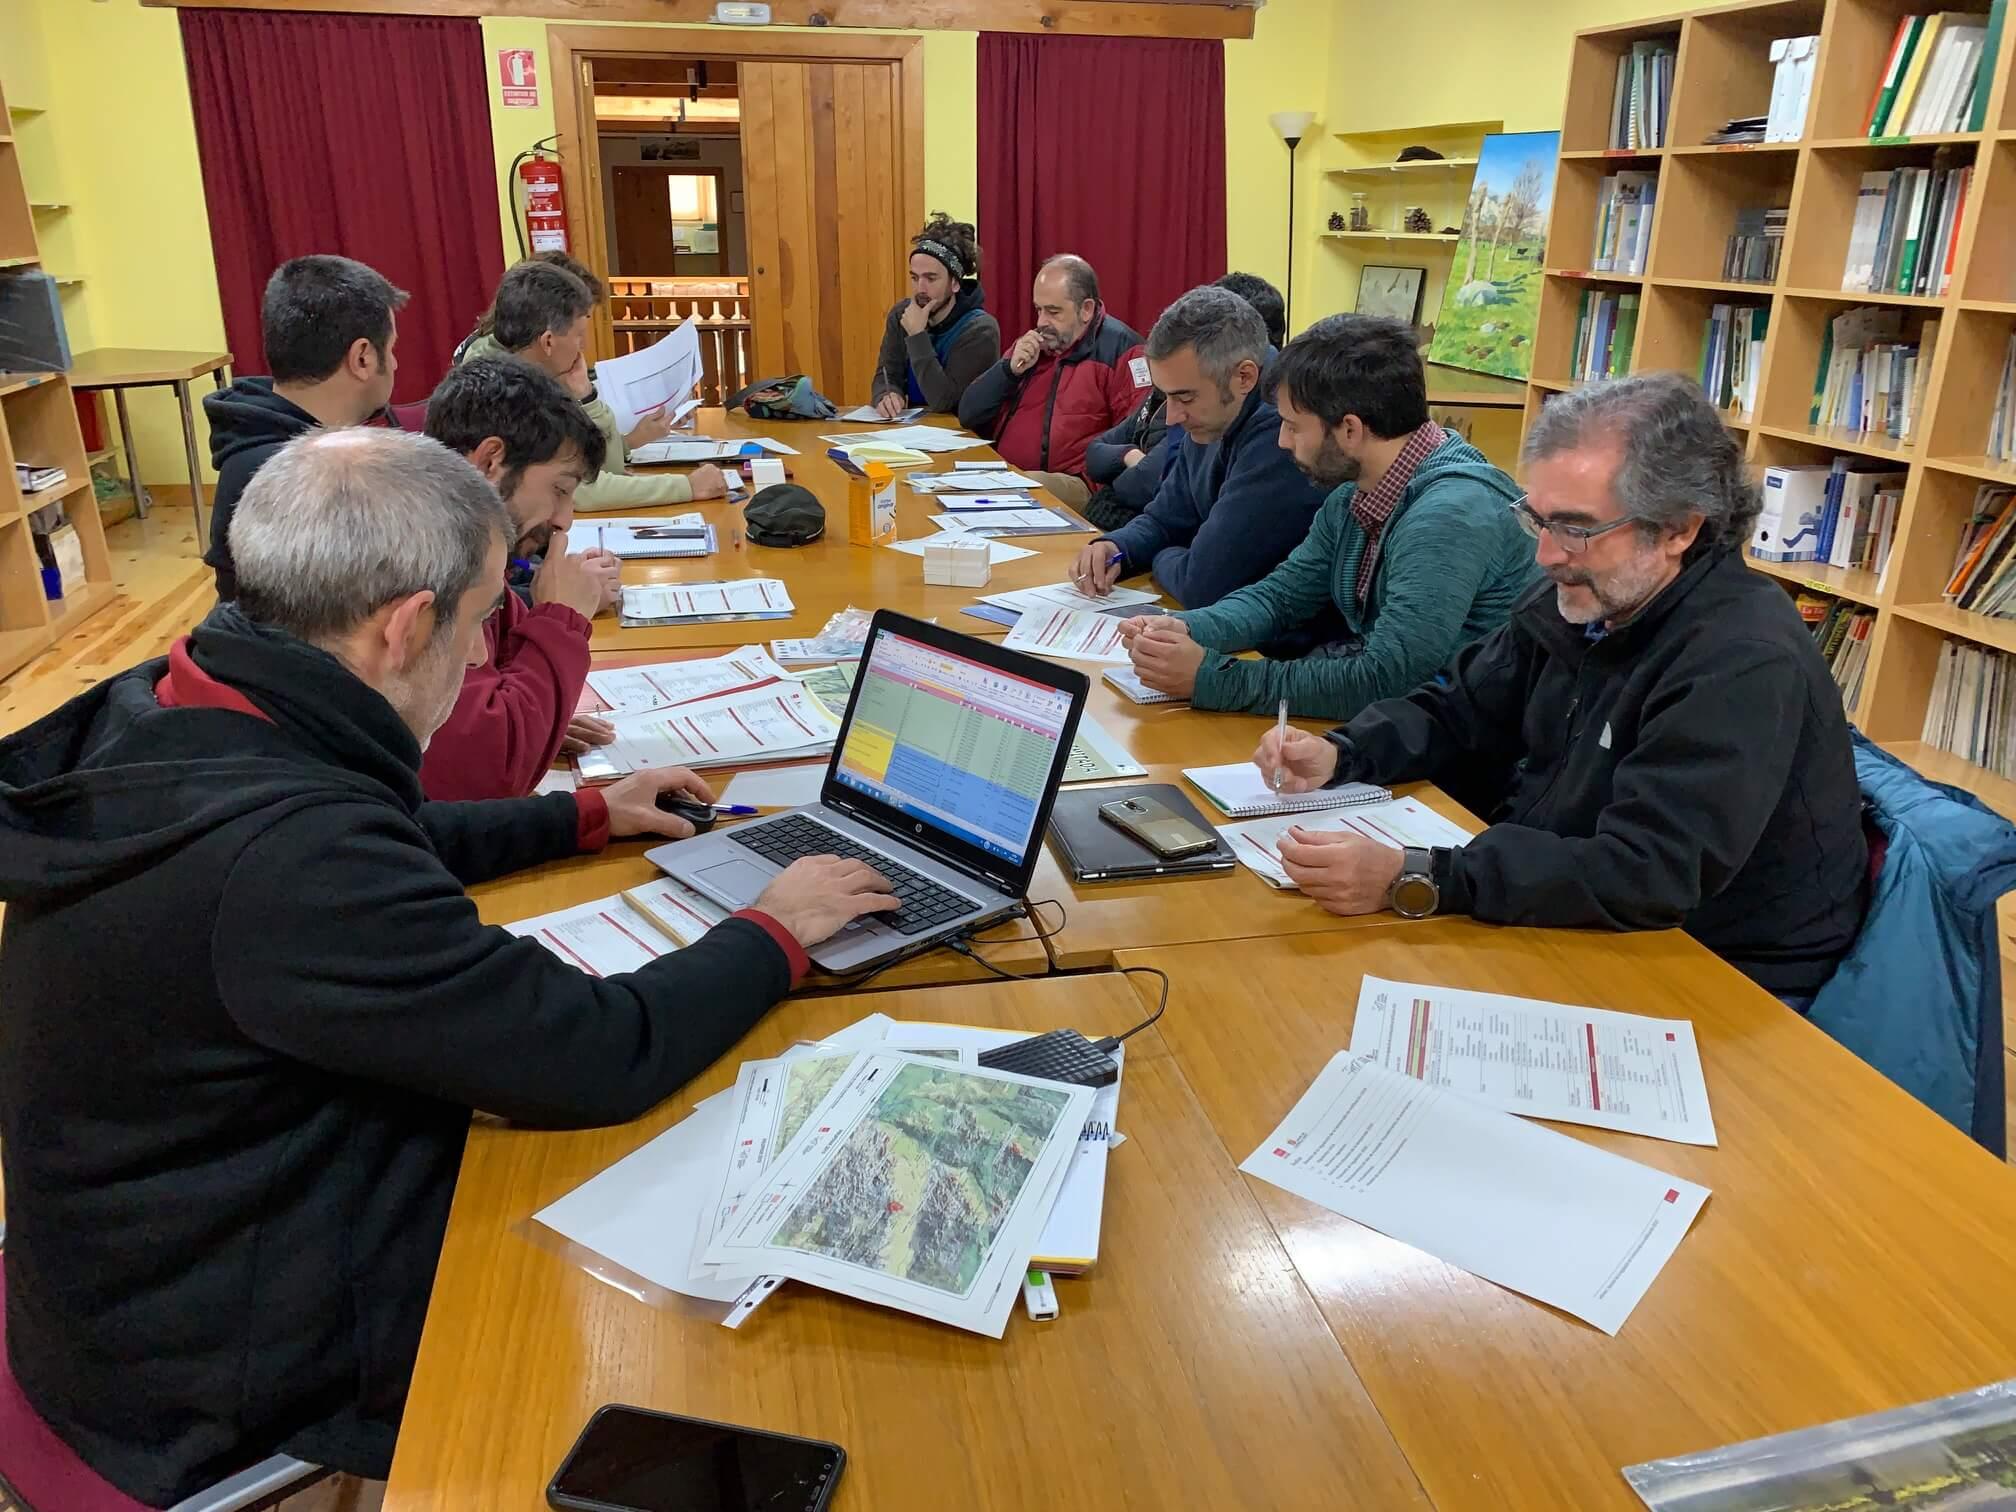 Reunión Regulación Dinámica Escalada Parque Nacional Sierra de Guadarrama